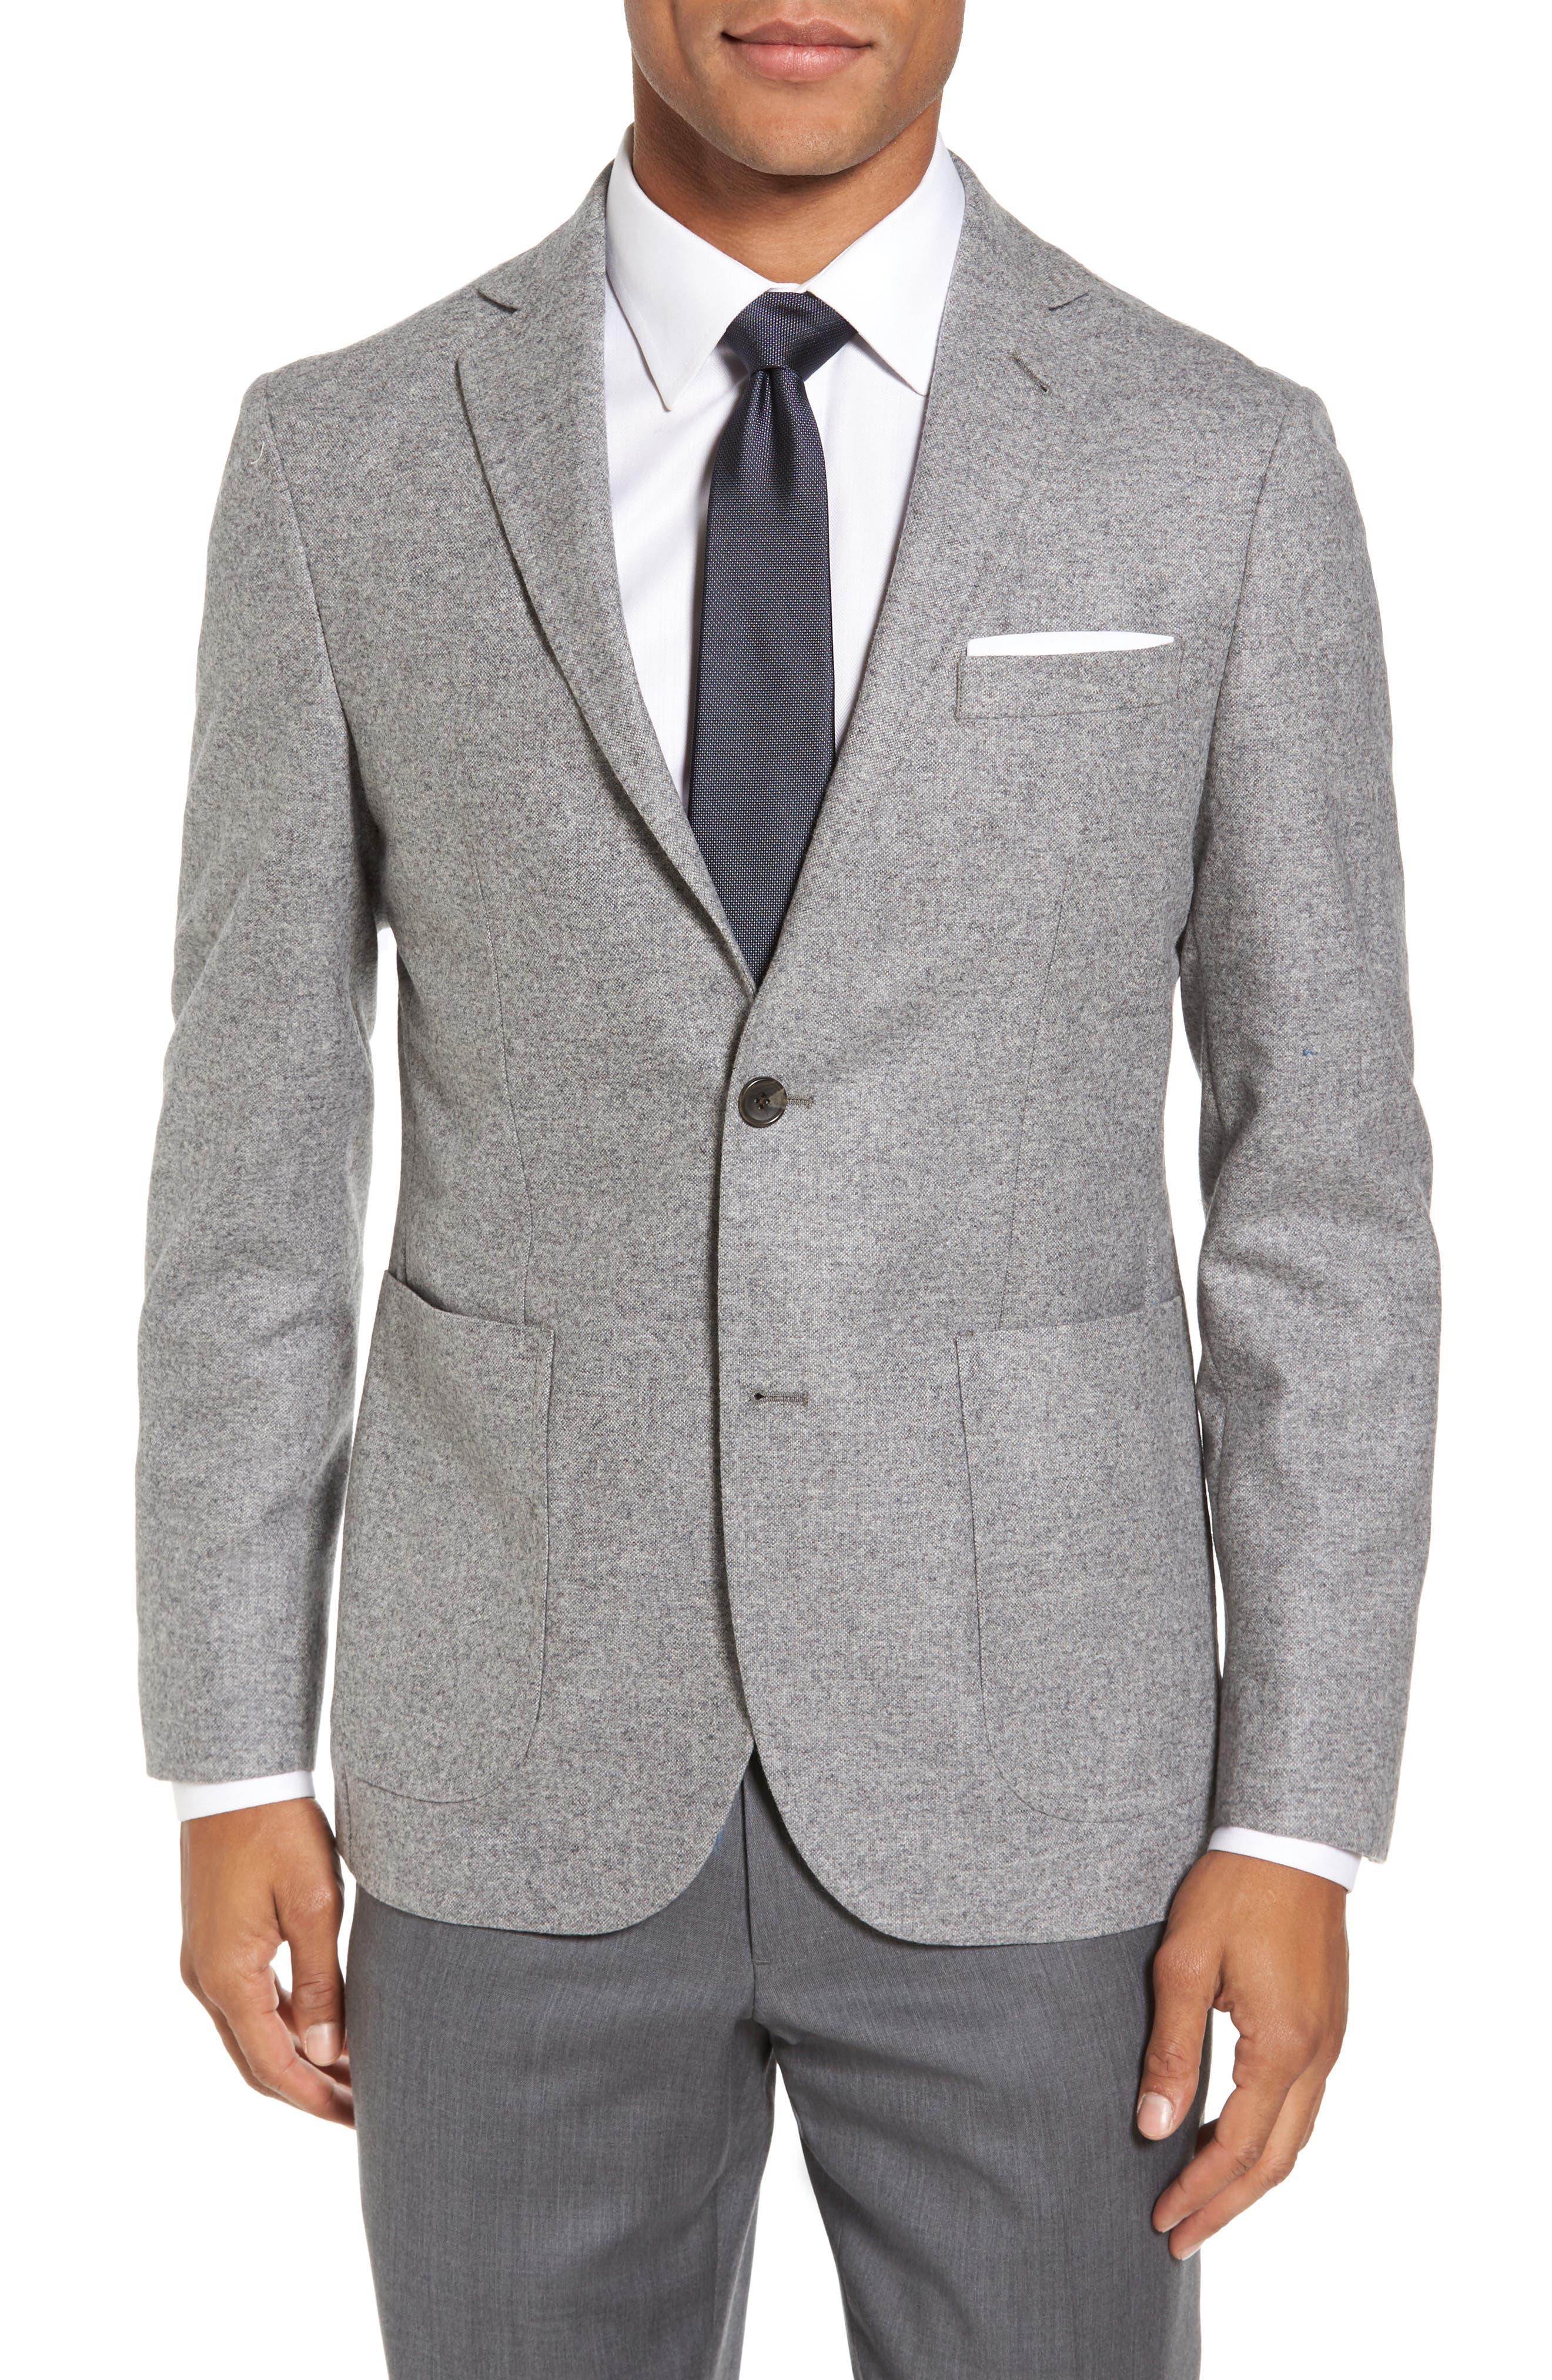 Strong Suit Vantage Trim Fit Wool & Silk Blazer